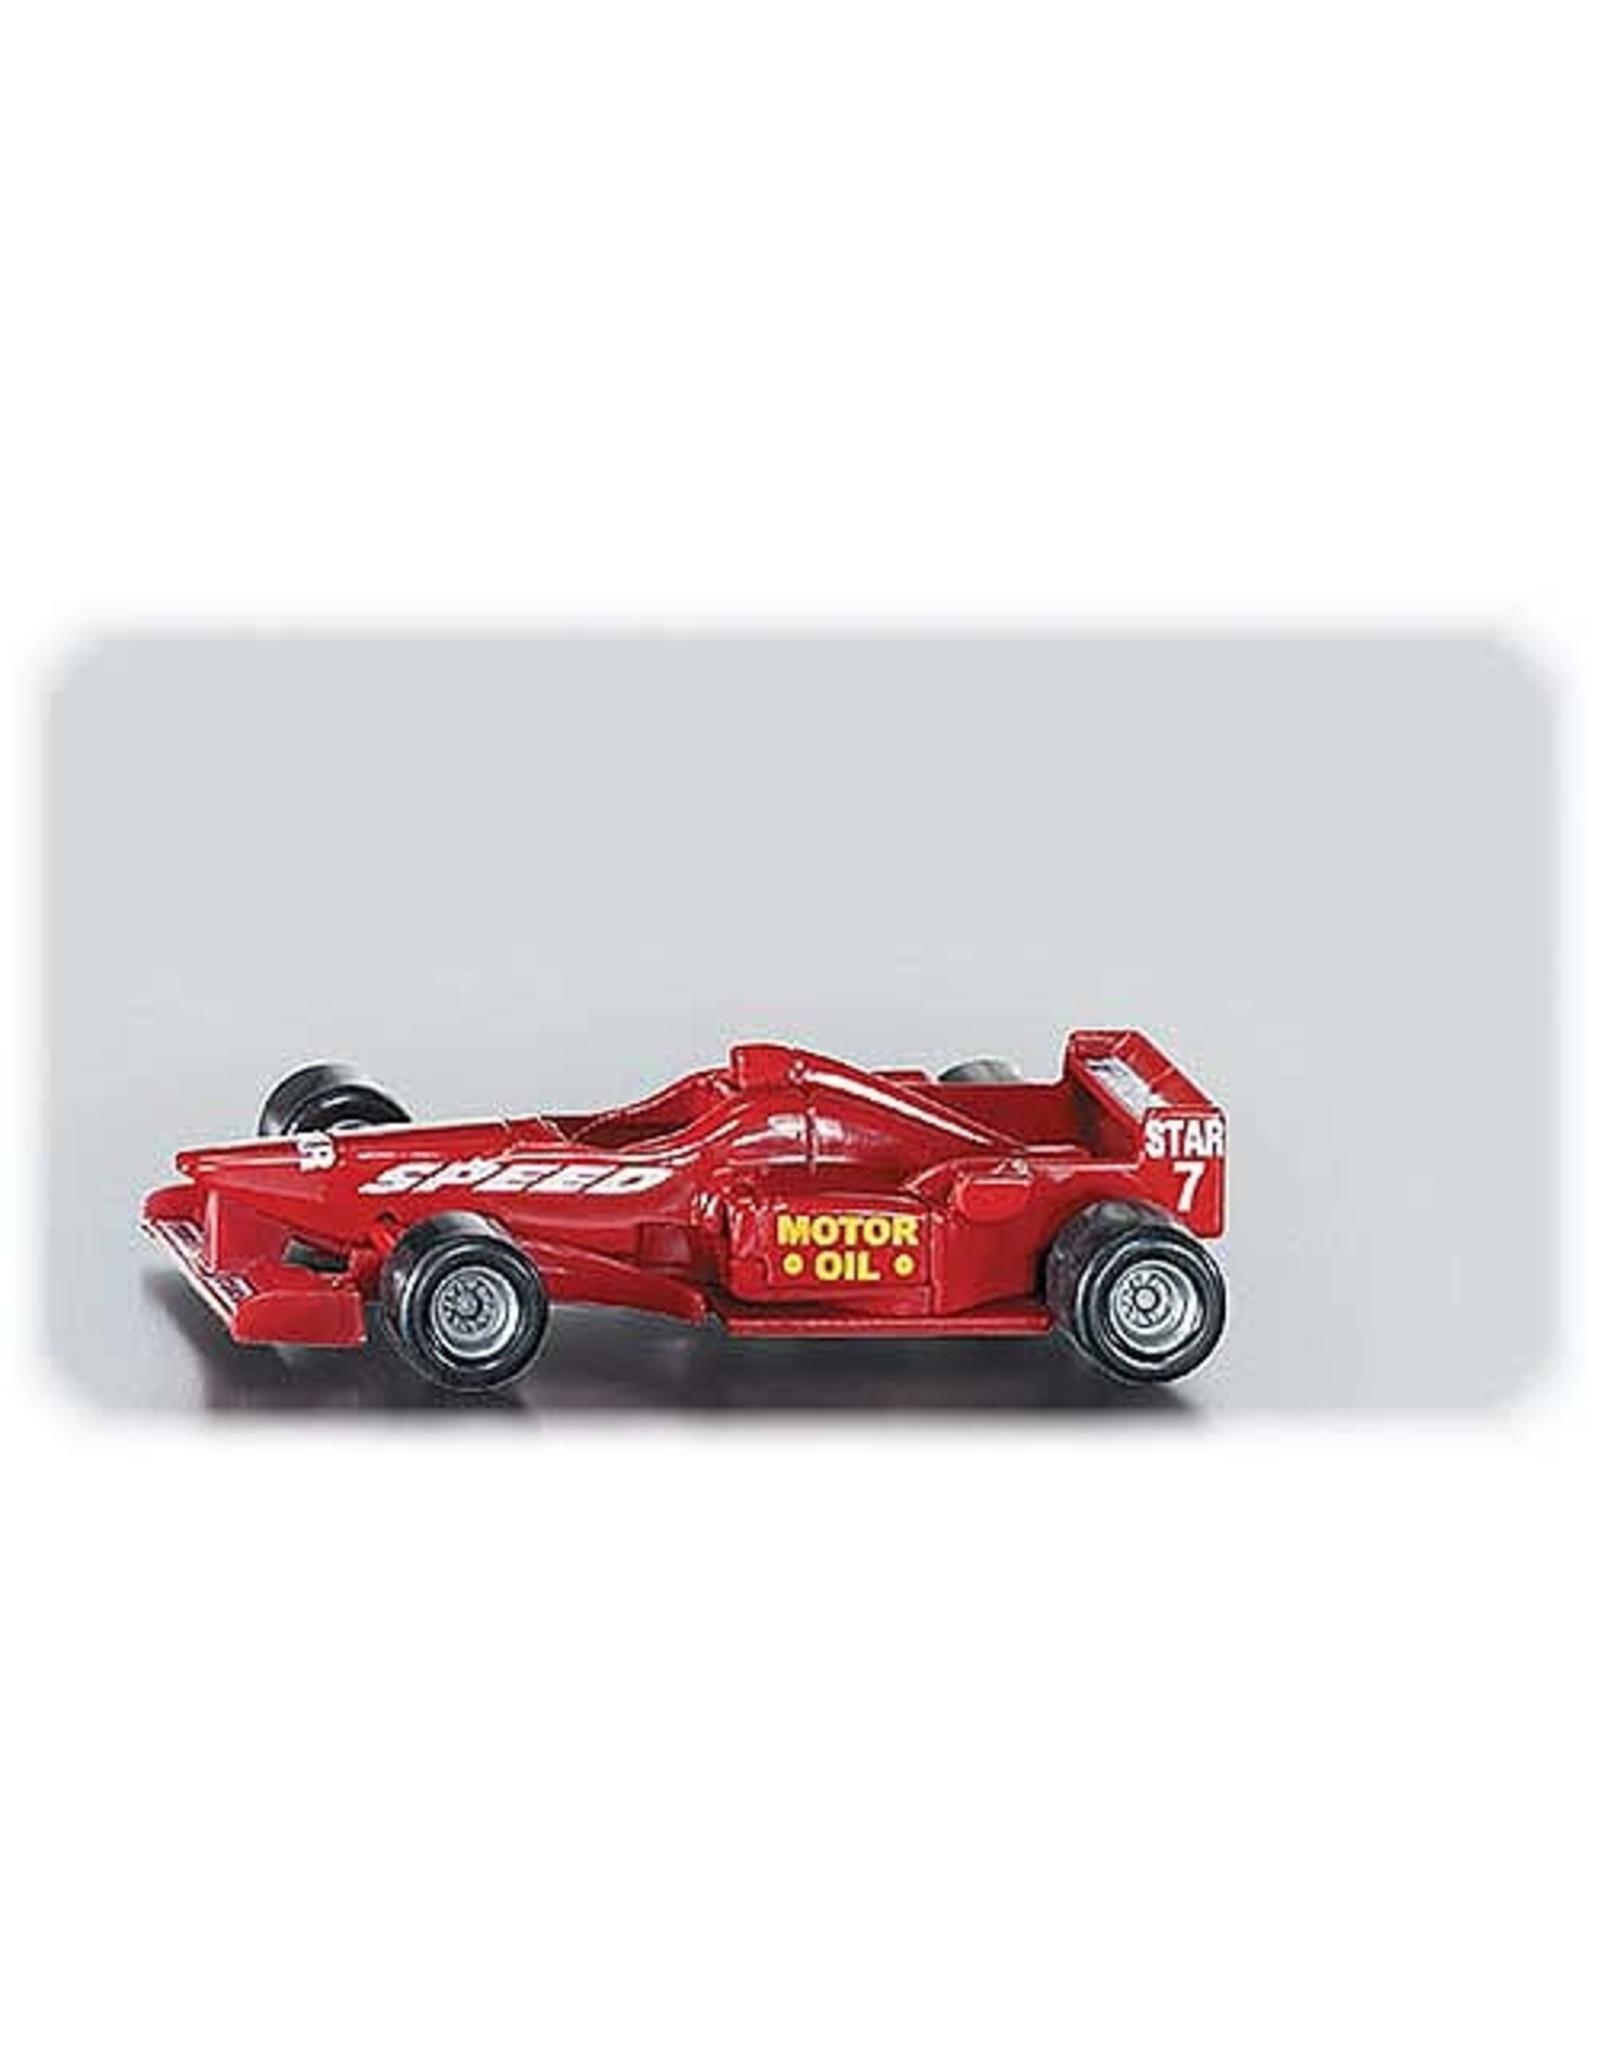 Siku Siku 1357 - Formule I Racing Car